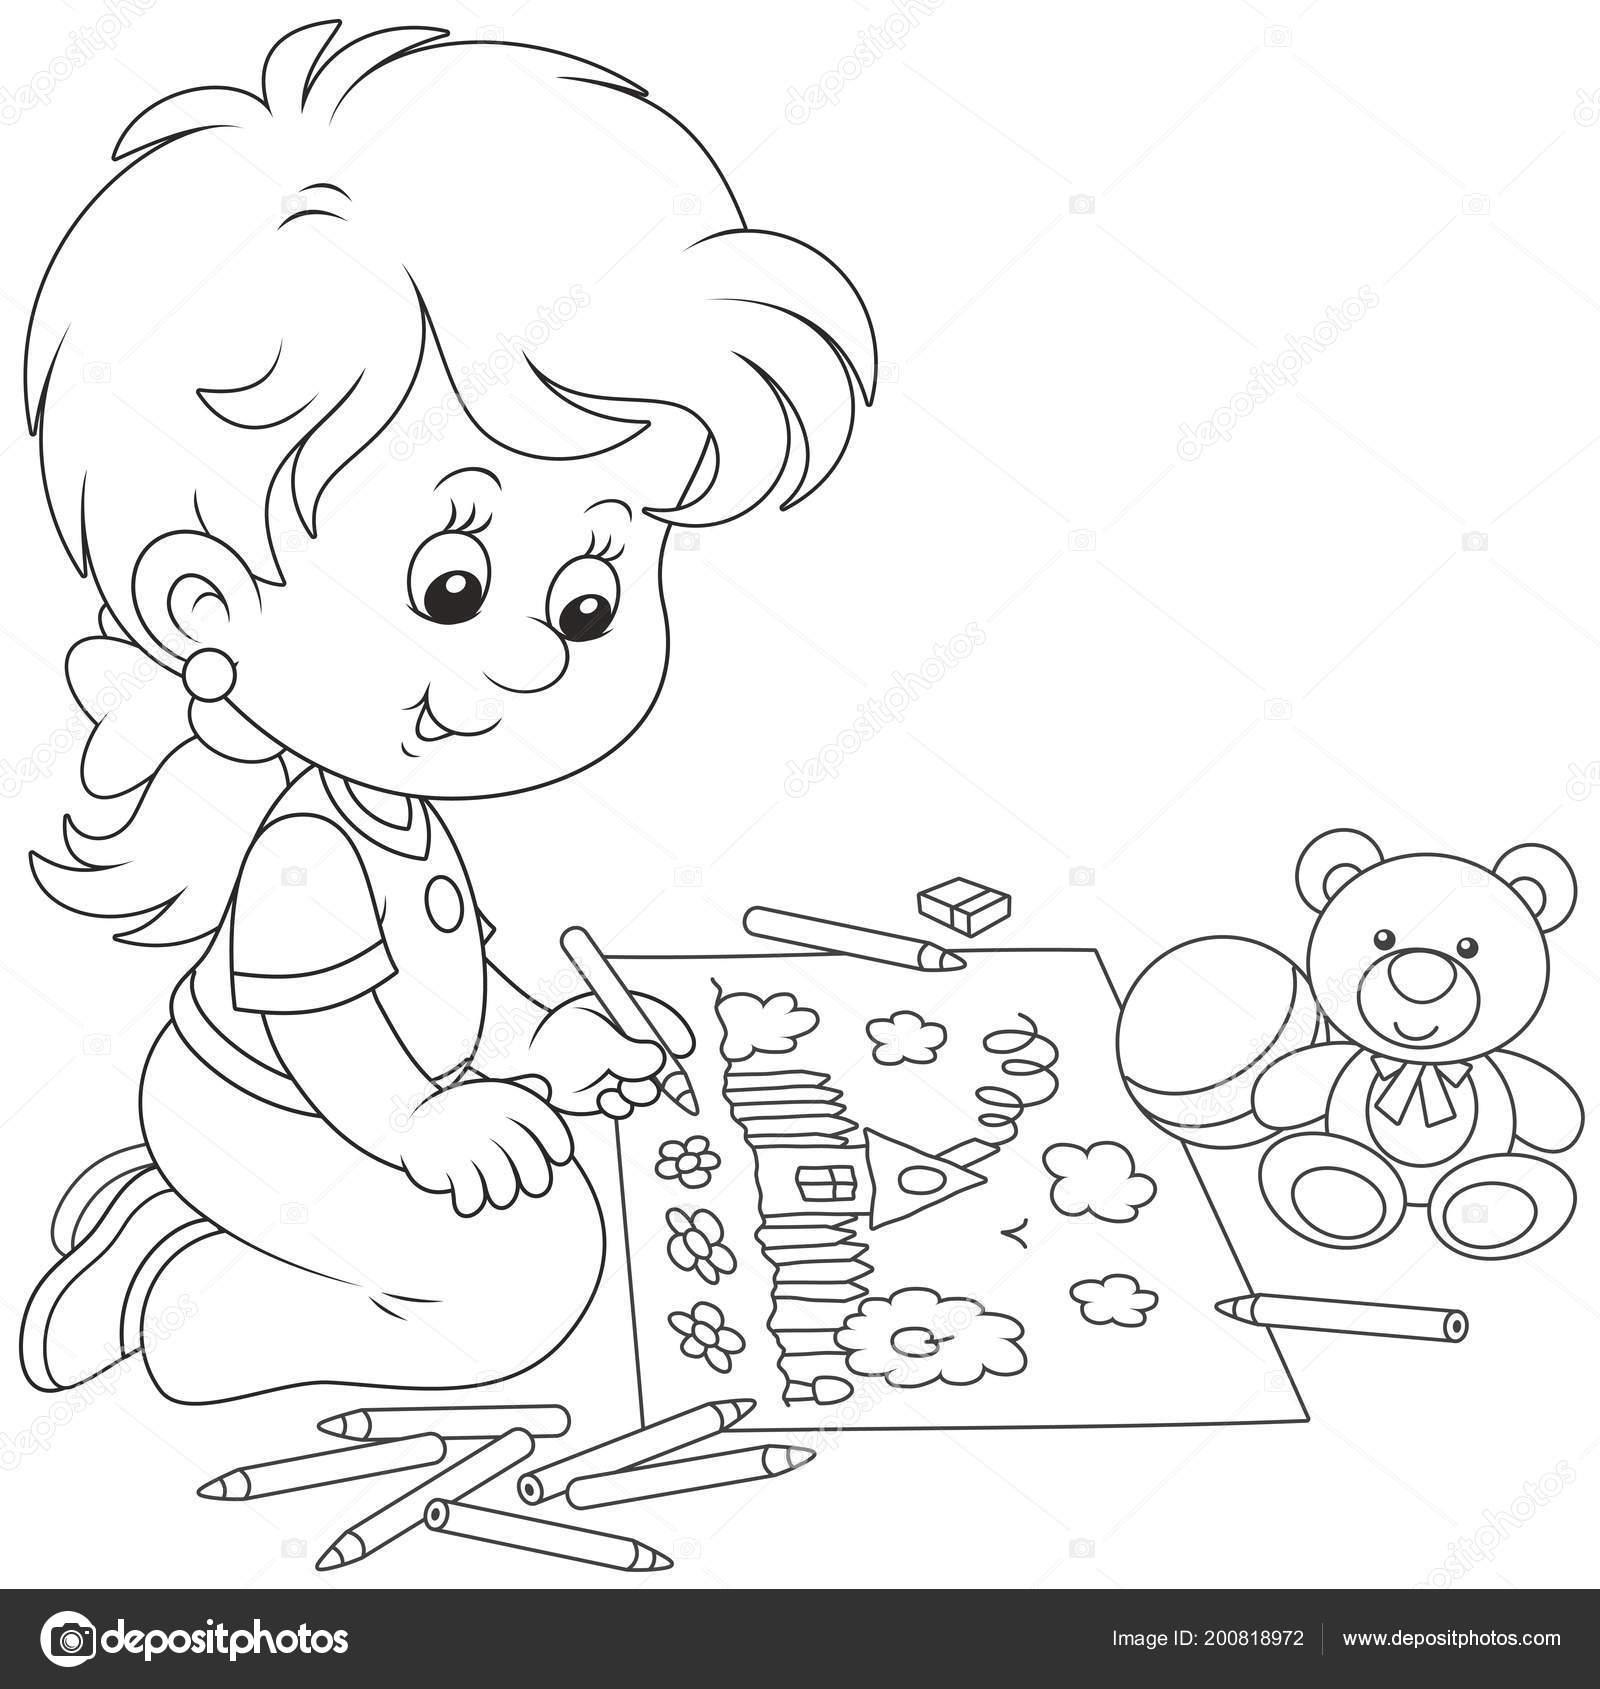 Animado Niña Estudiando Para Colorear Niña Dibujo Con Lápices Una